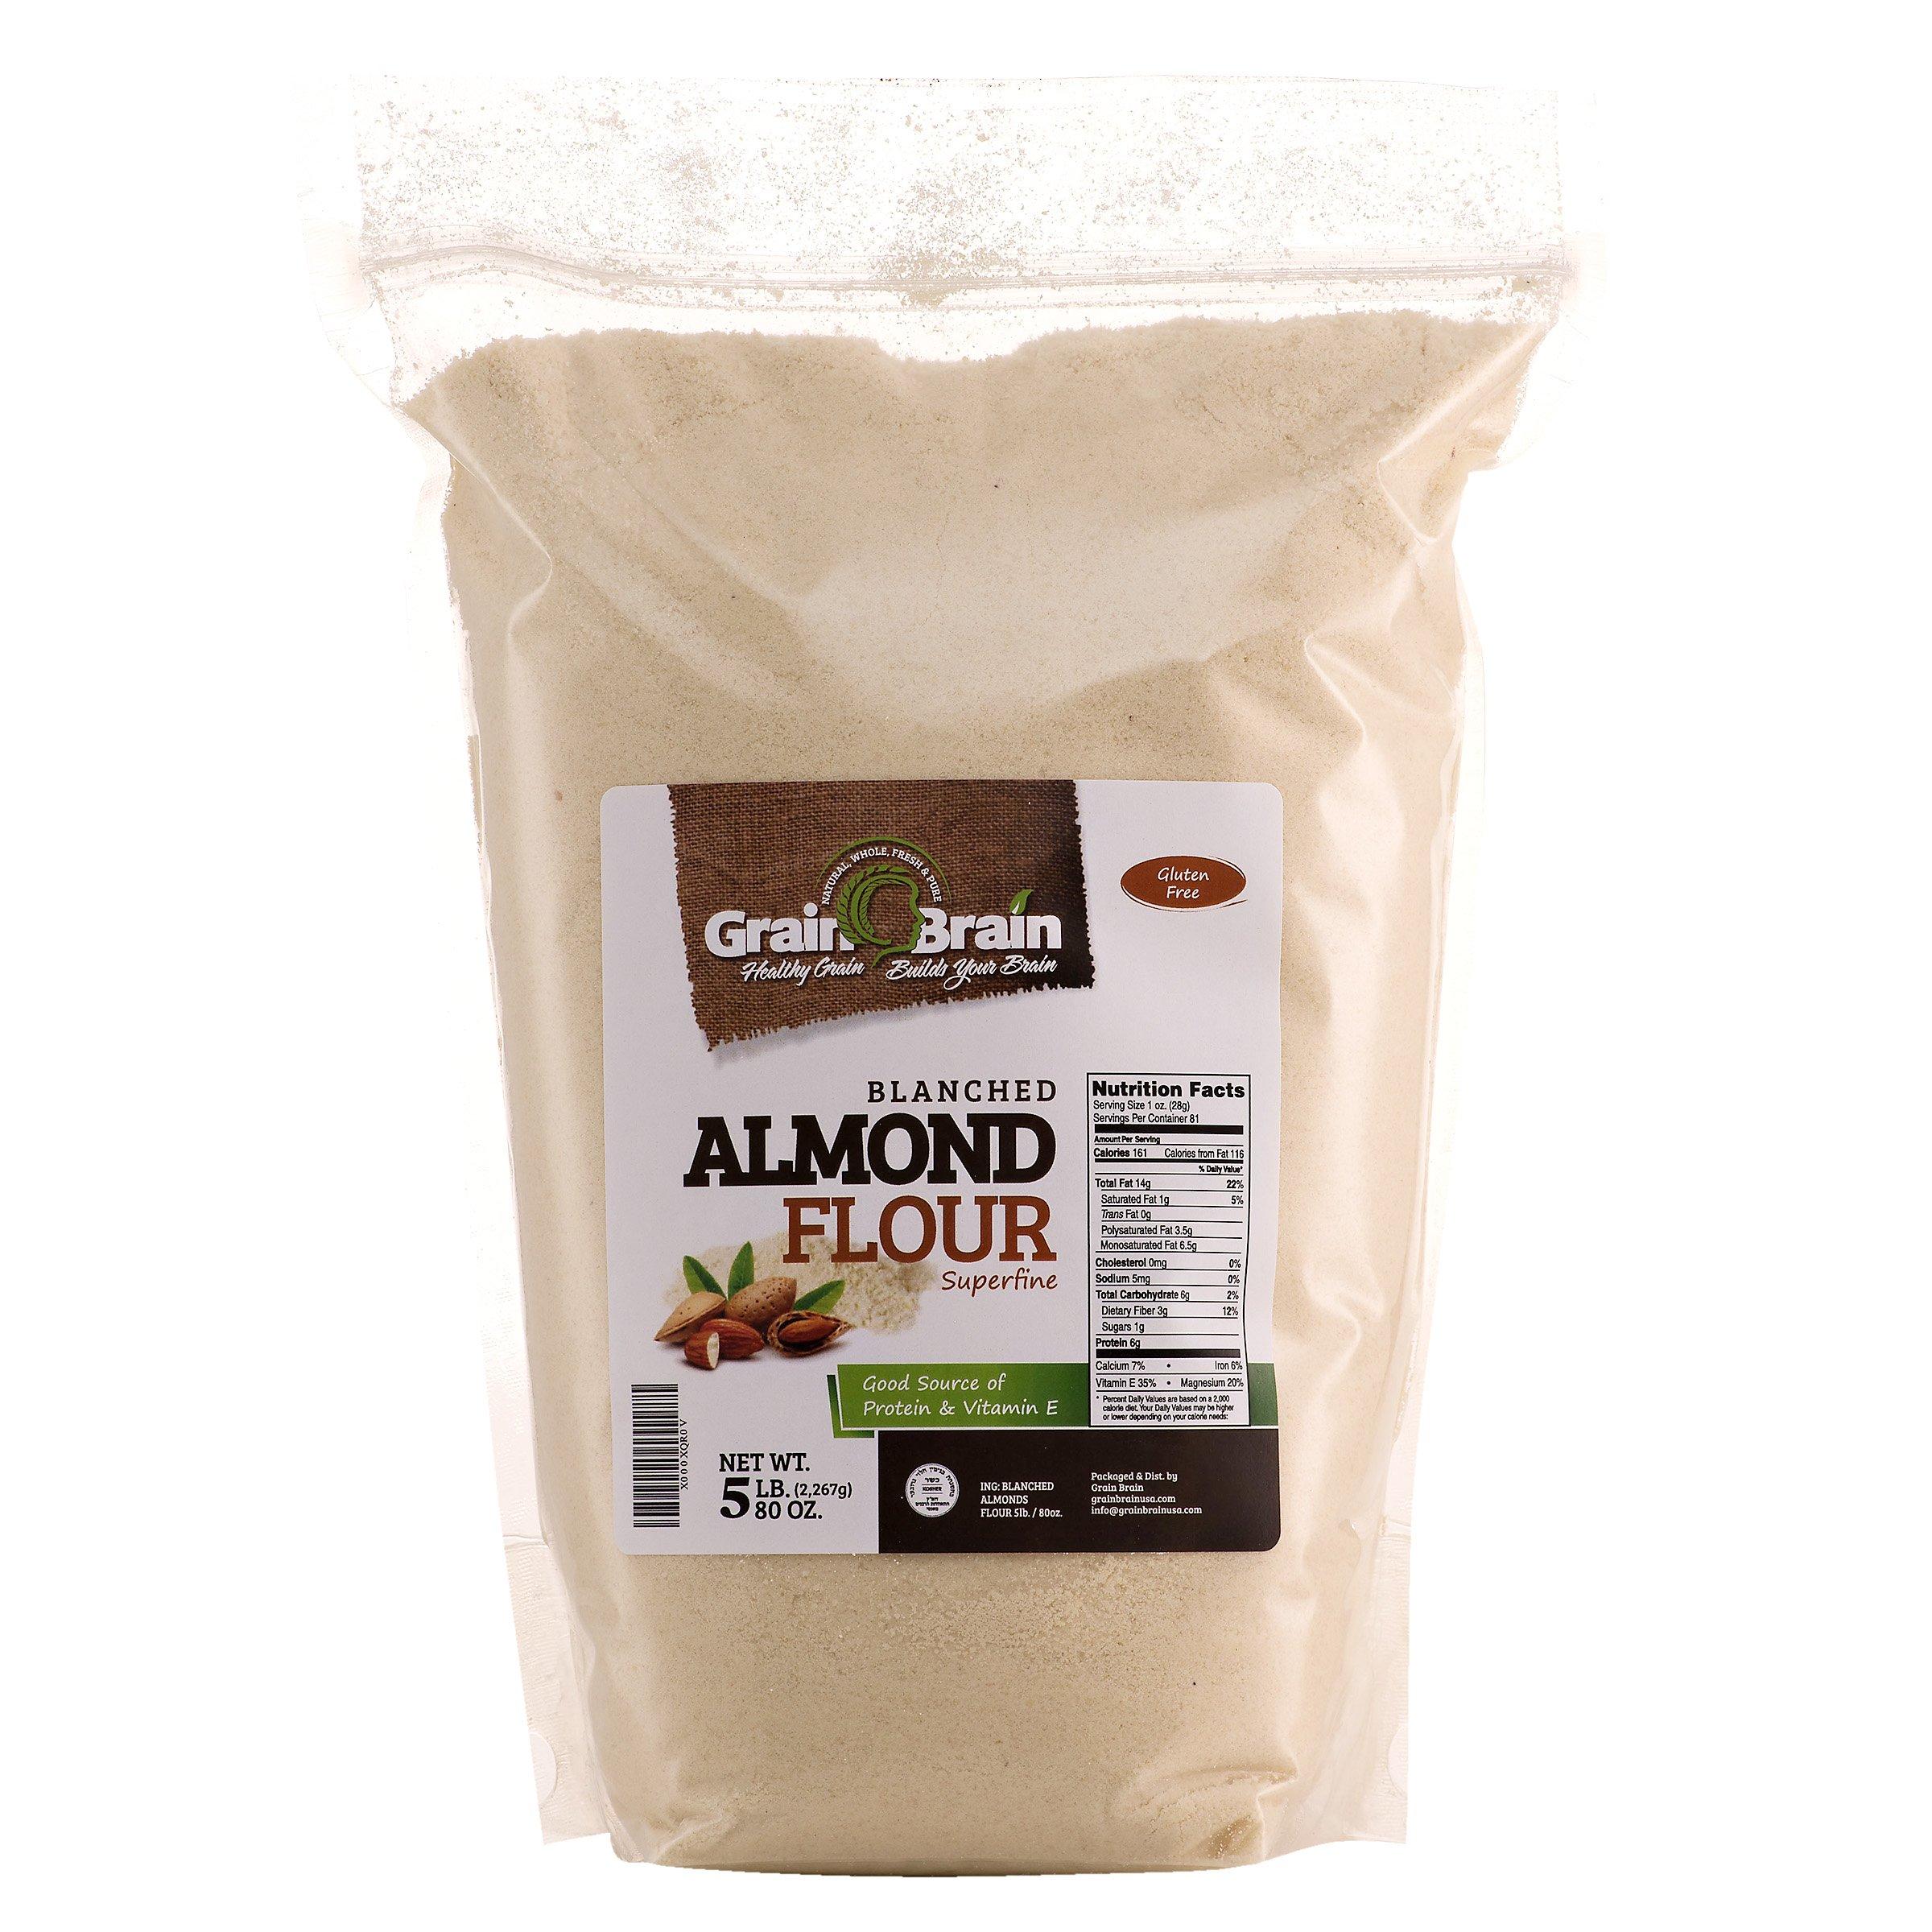 GRAIN BRAIN Blanched Almond Flour/Meal, Super Fine Grind, 5 lb